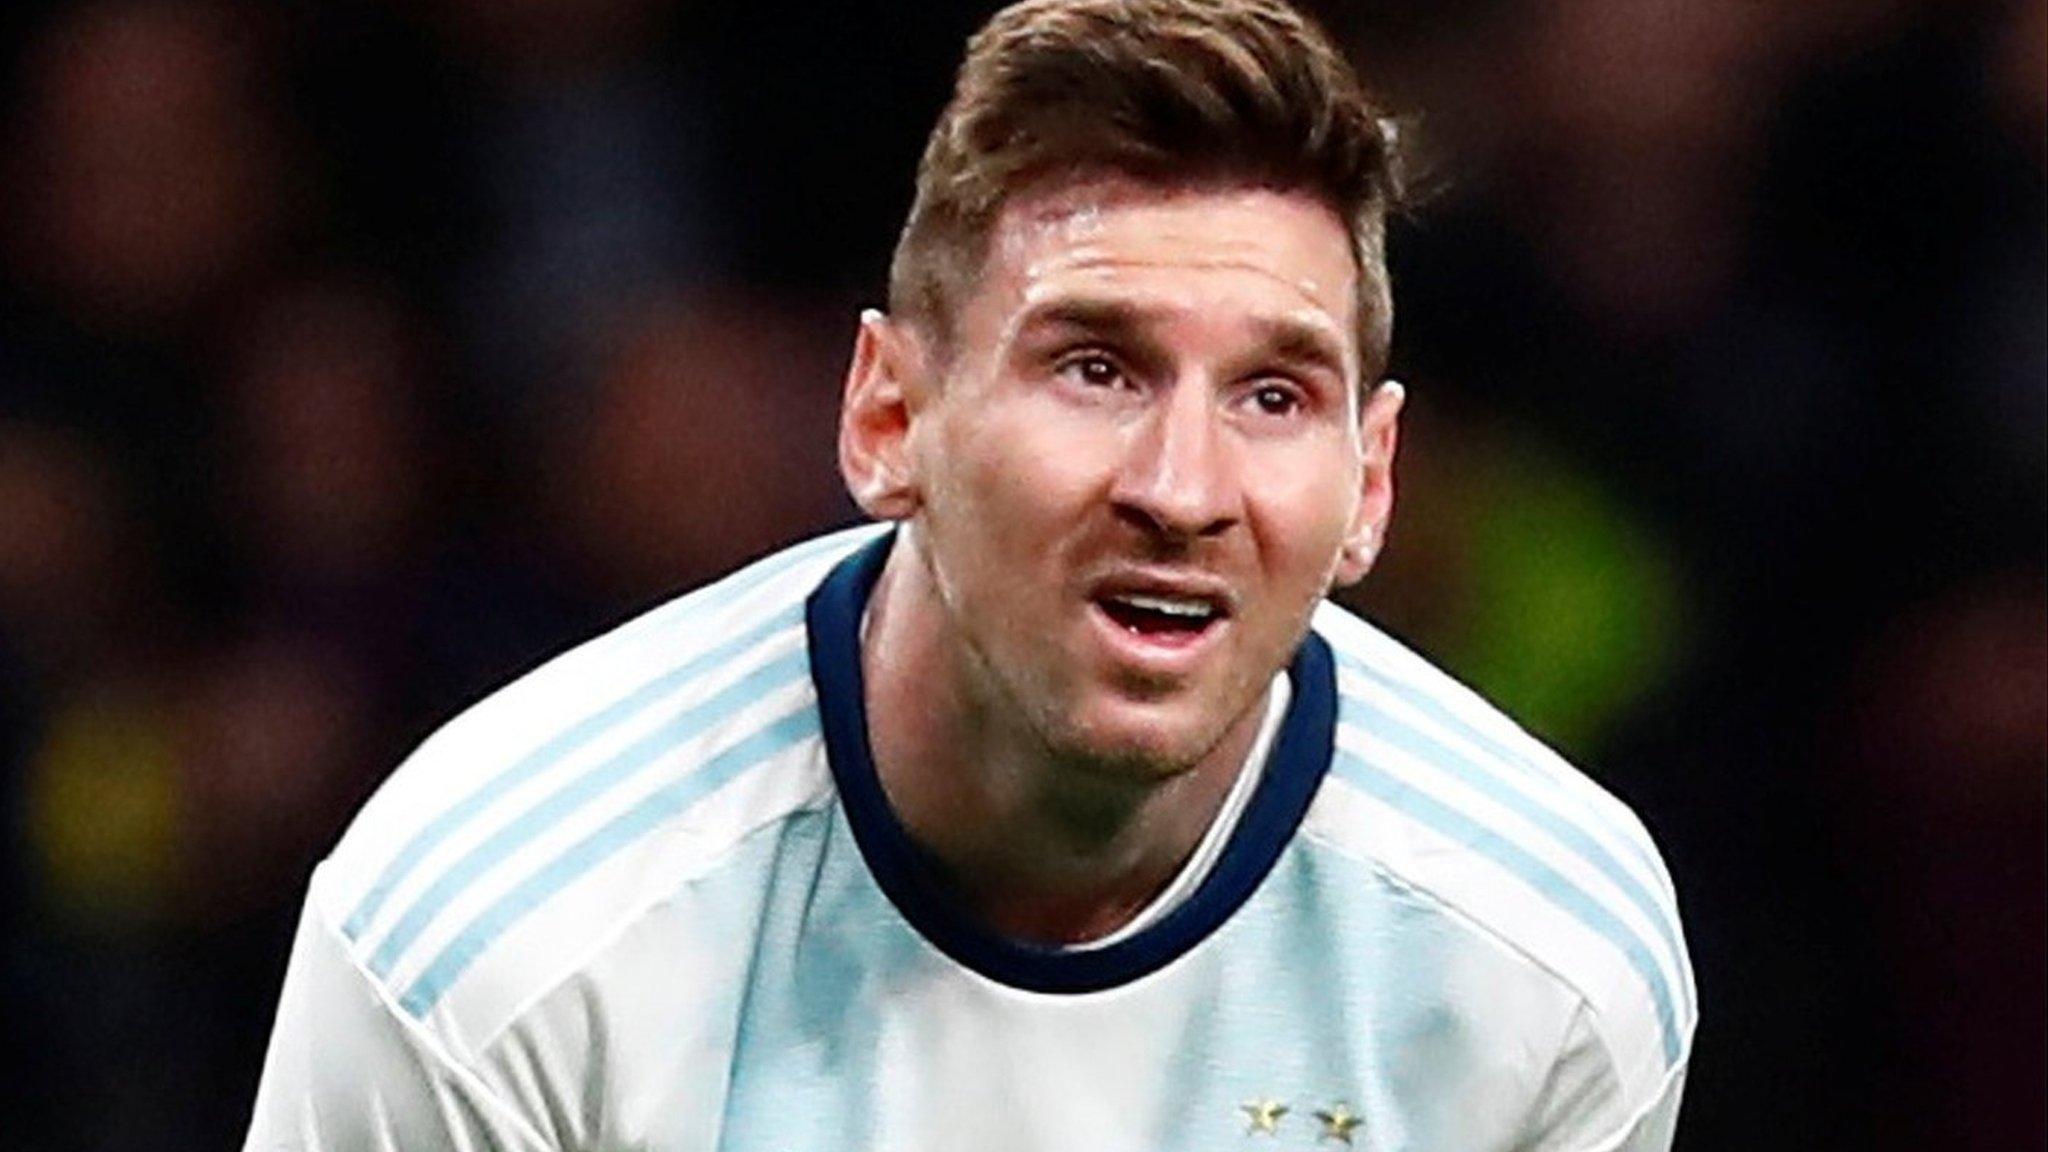 Lionel Messi's return for Argentina ends in 3-1 defeat against Venezuela